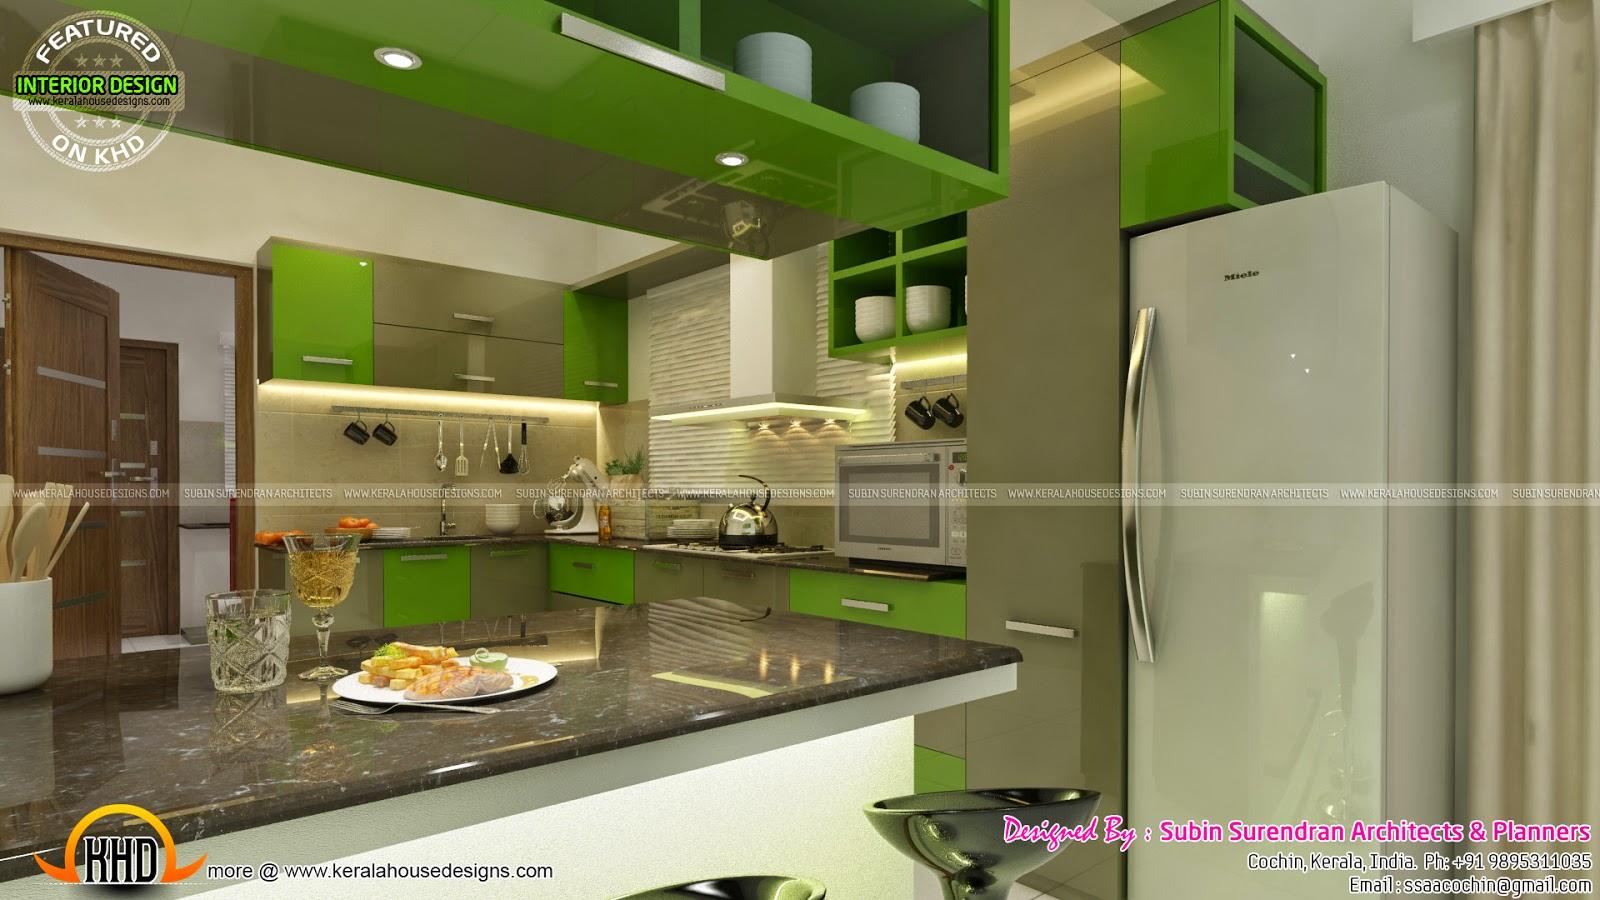 captivating home interior design kitchen | TV room, living, bedroom, kitchen interior - Kerala home ...